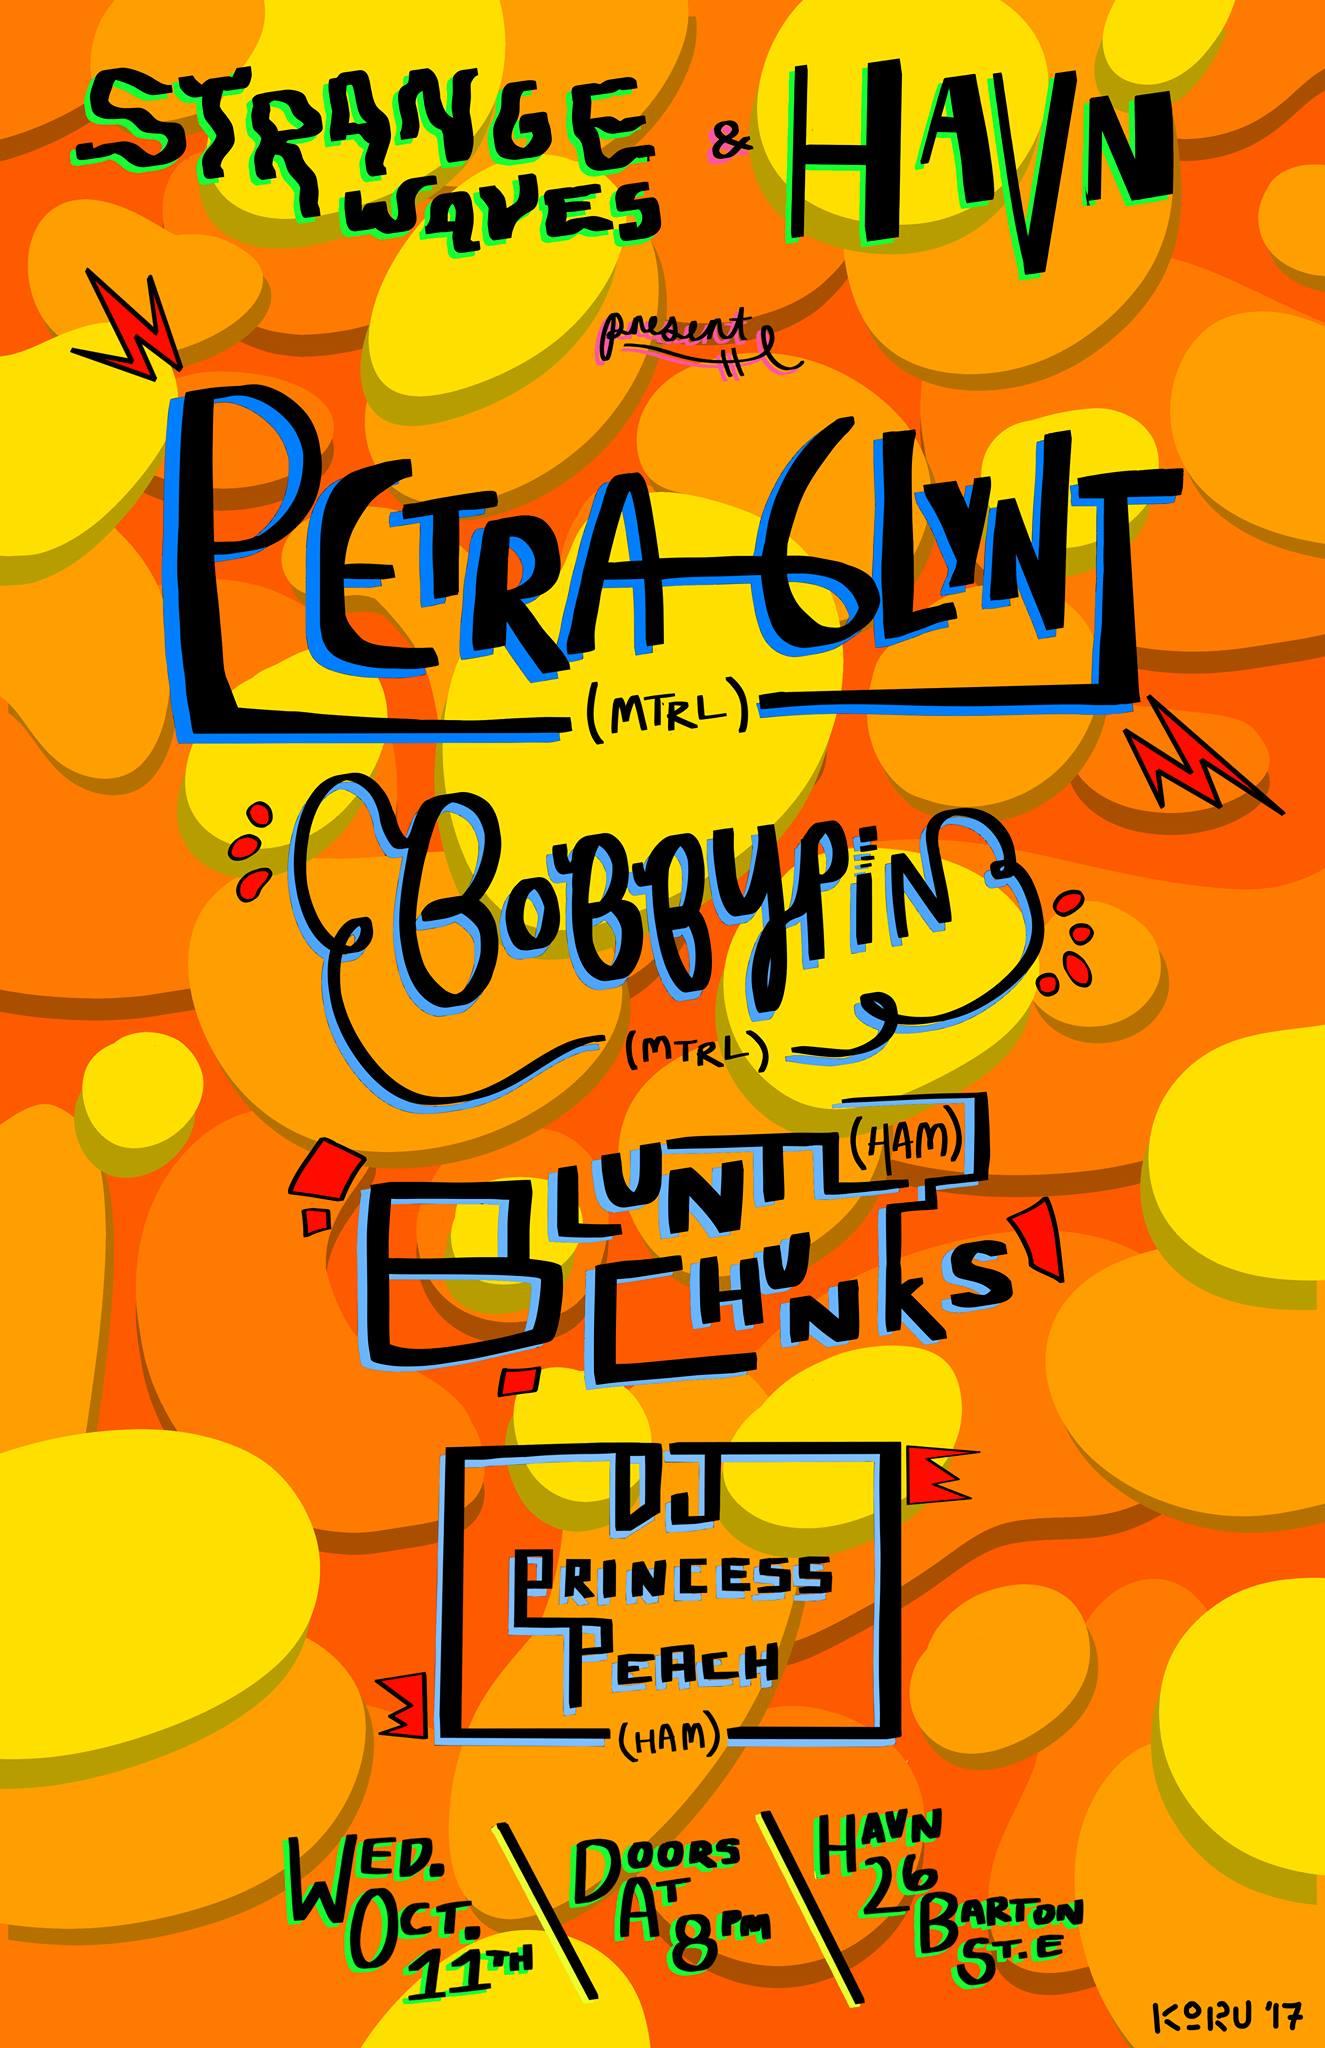 Petra Glynt, Bobbypin, Blunt Chunks, DJ Princess Peach  @HAVN